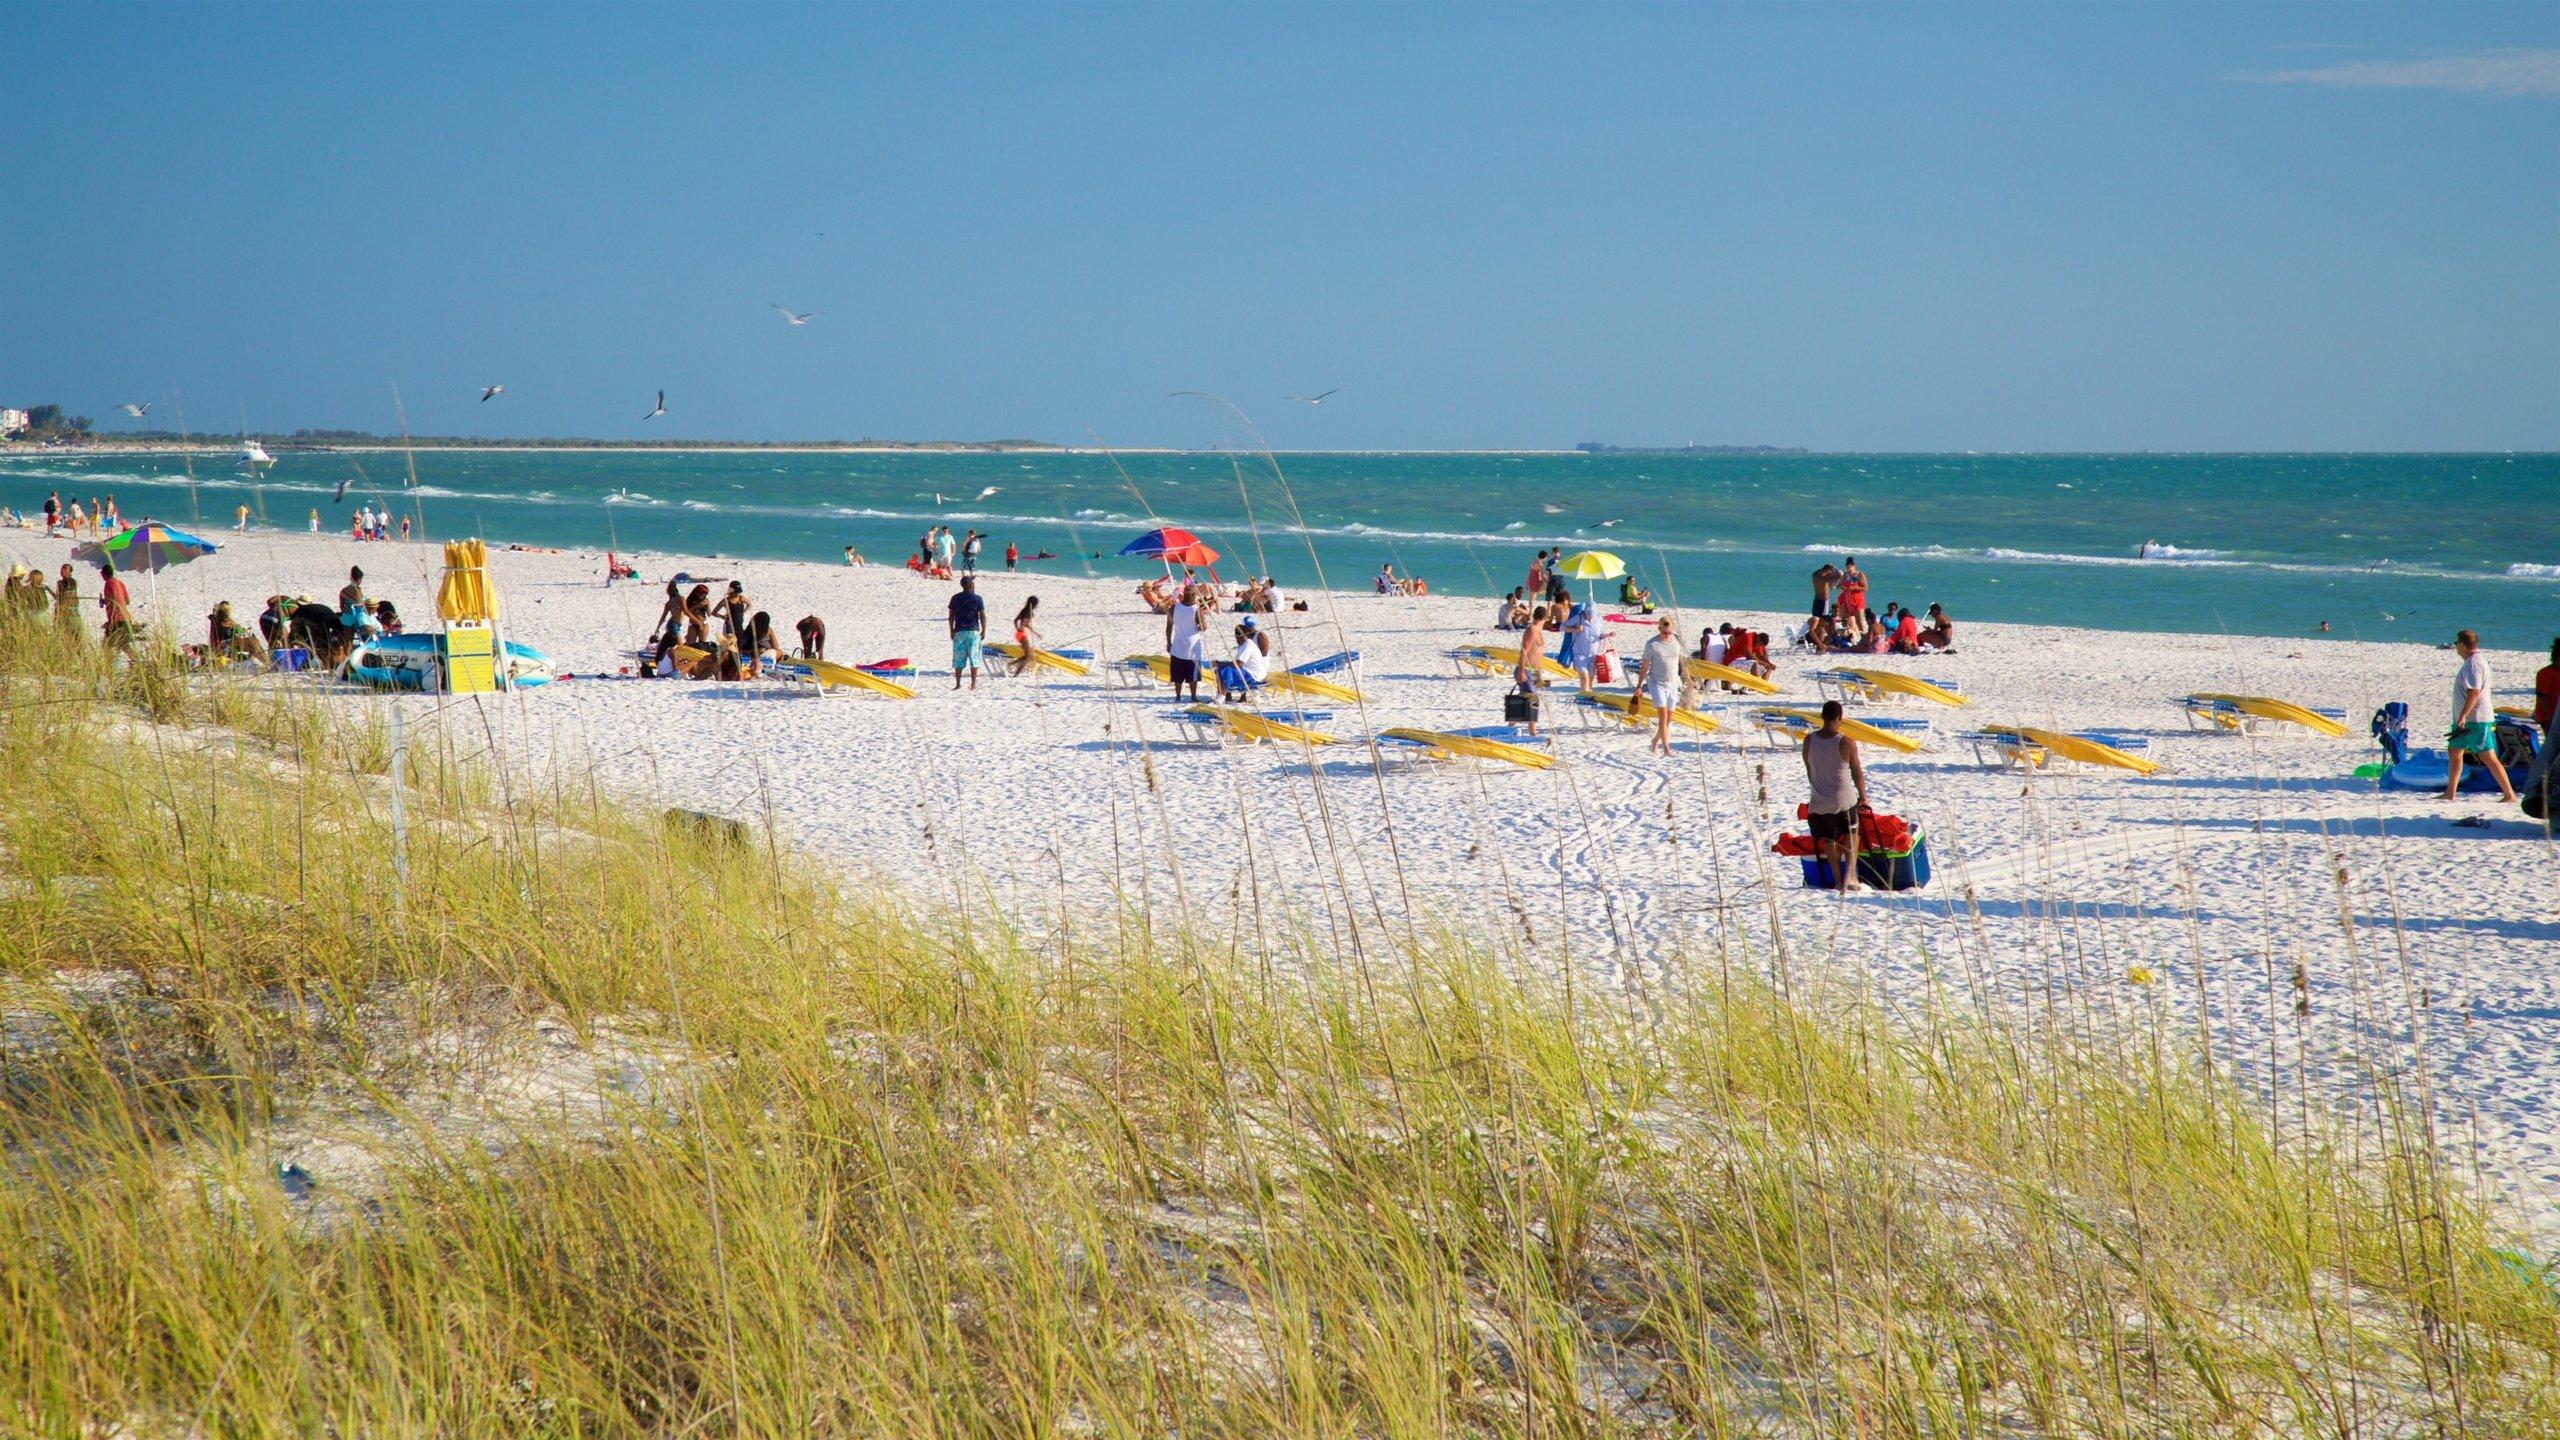 Top 10 Beach Hotels In St Pete Fl 89 Resorts Near The 2018